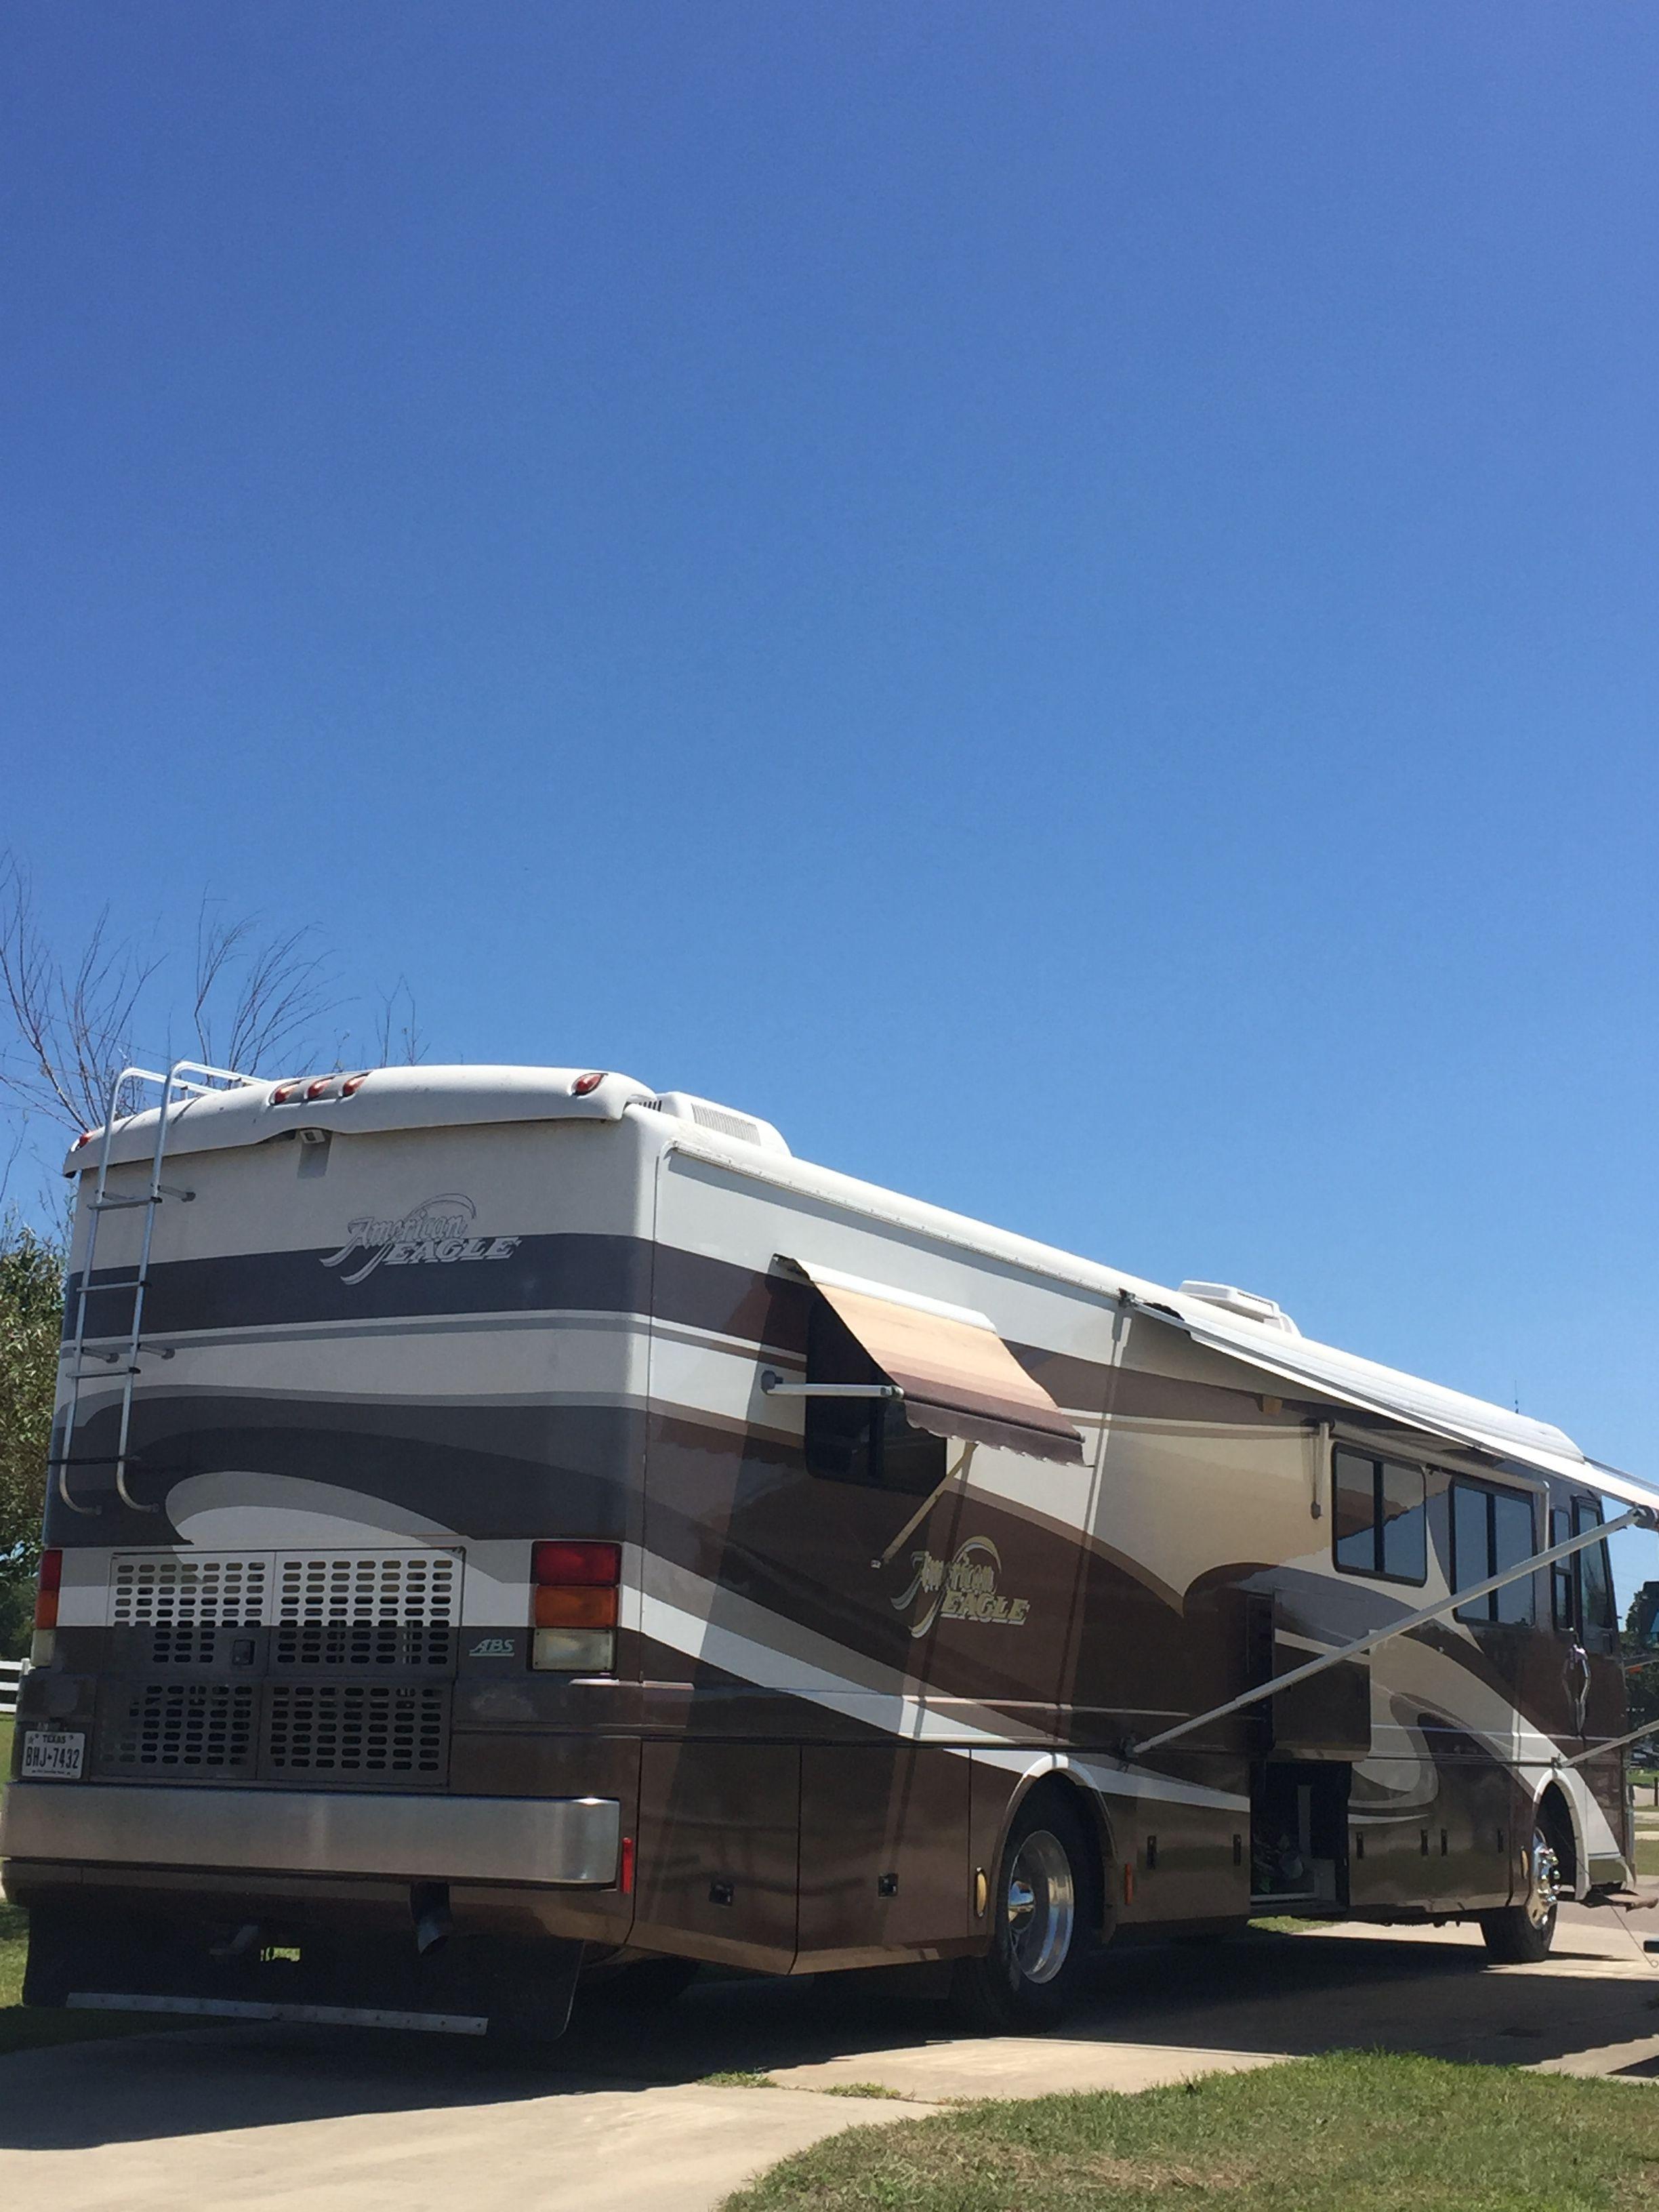 American Eagle Bjl Travel Fun Cool Campers Outdoor Fun